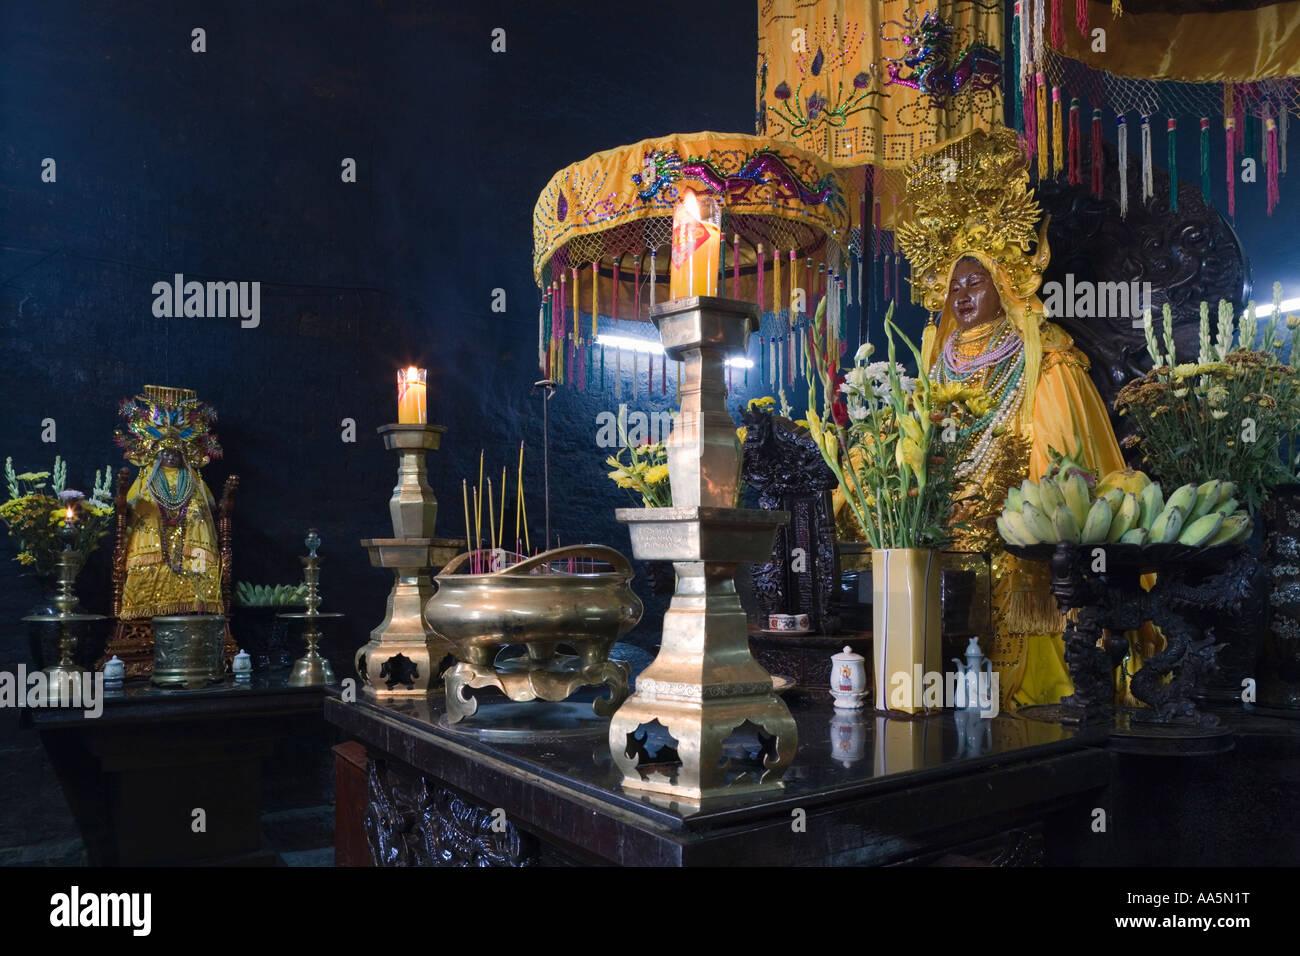 Nha Trang, Vietnam  Po Nagar Cham Towers  Shrine with statue